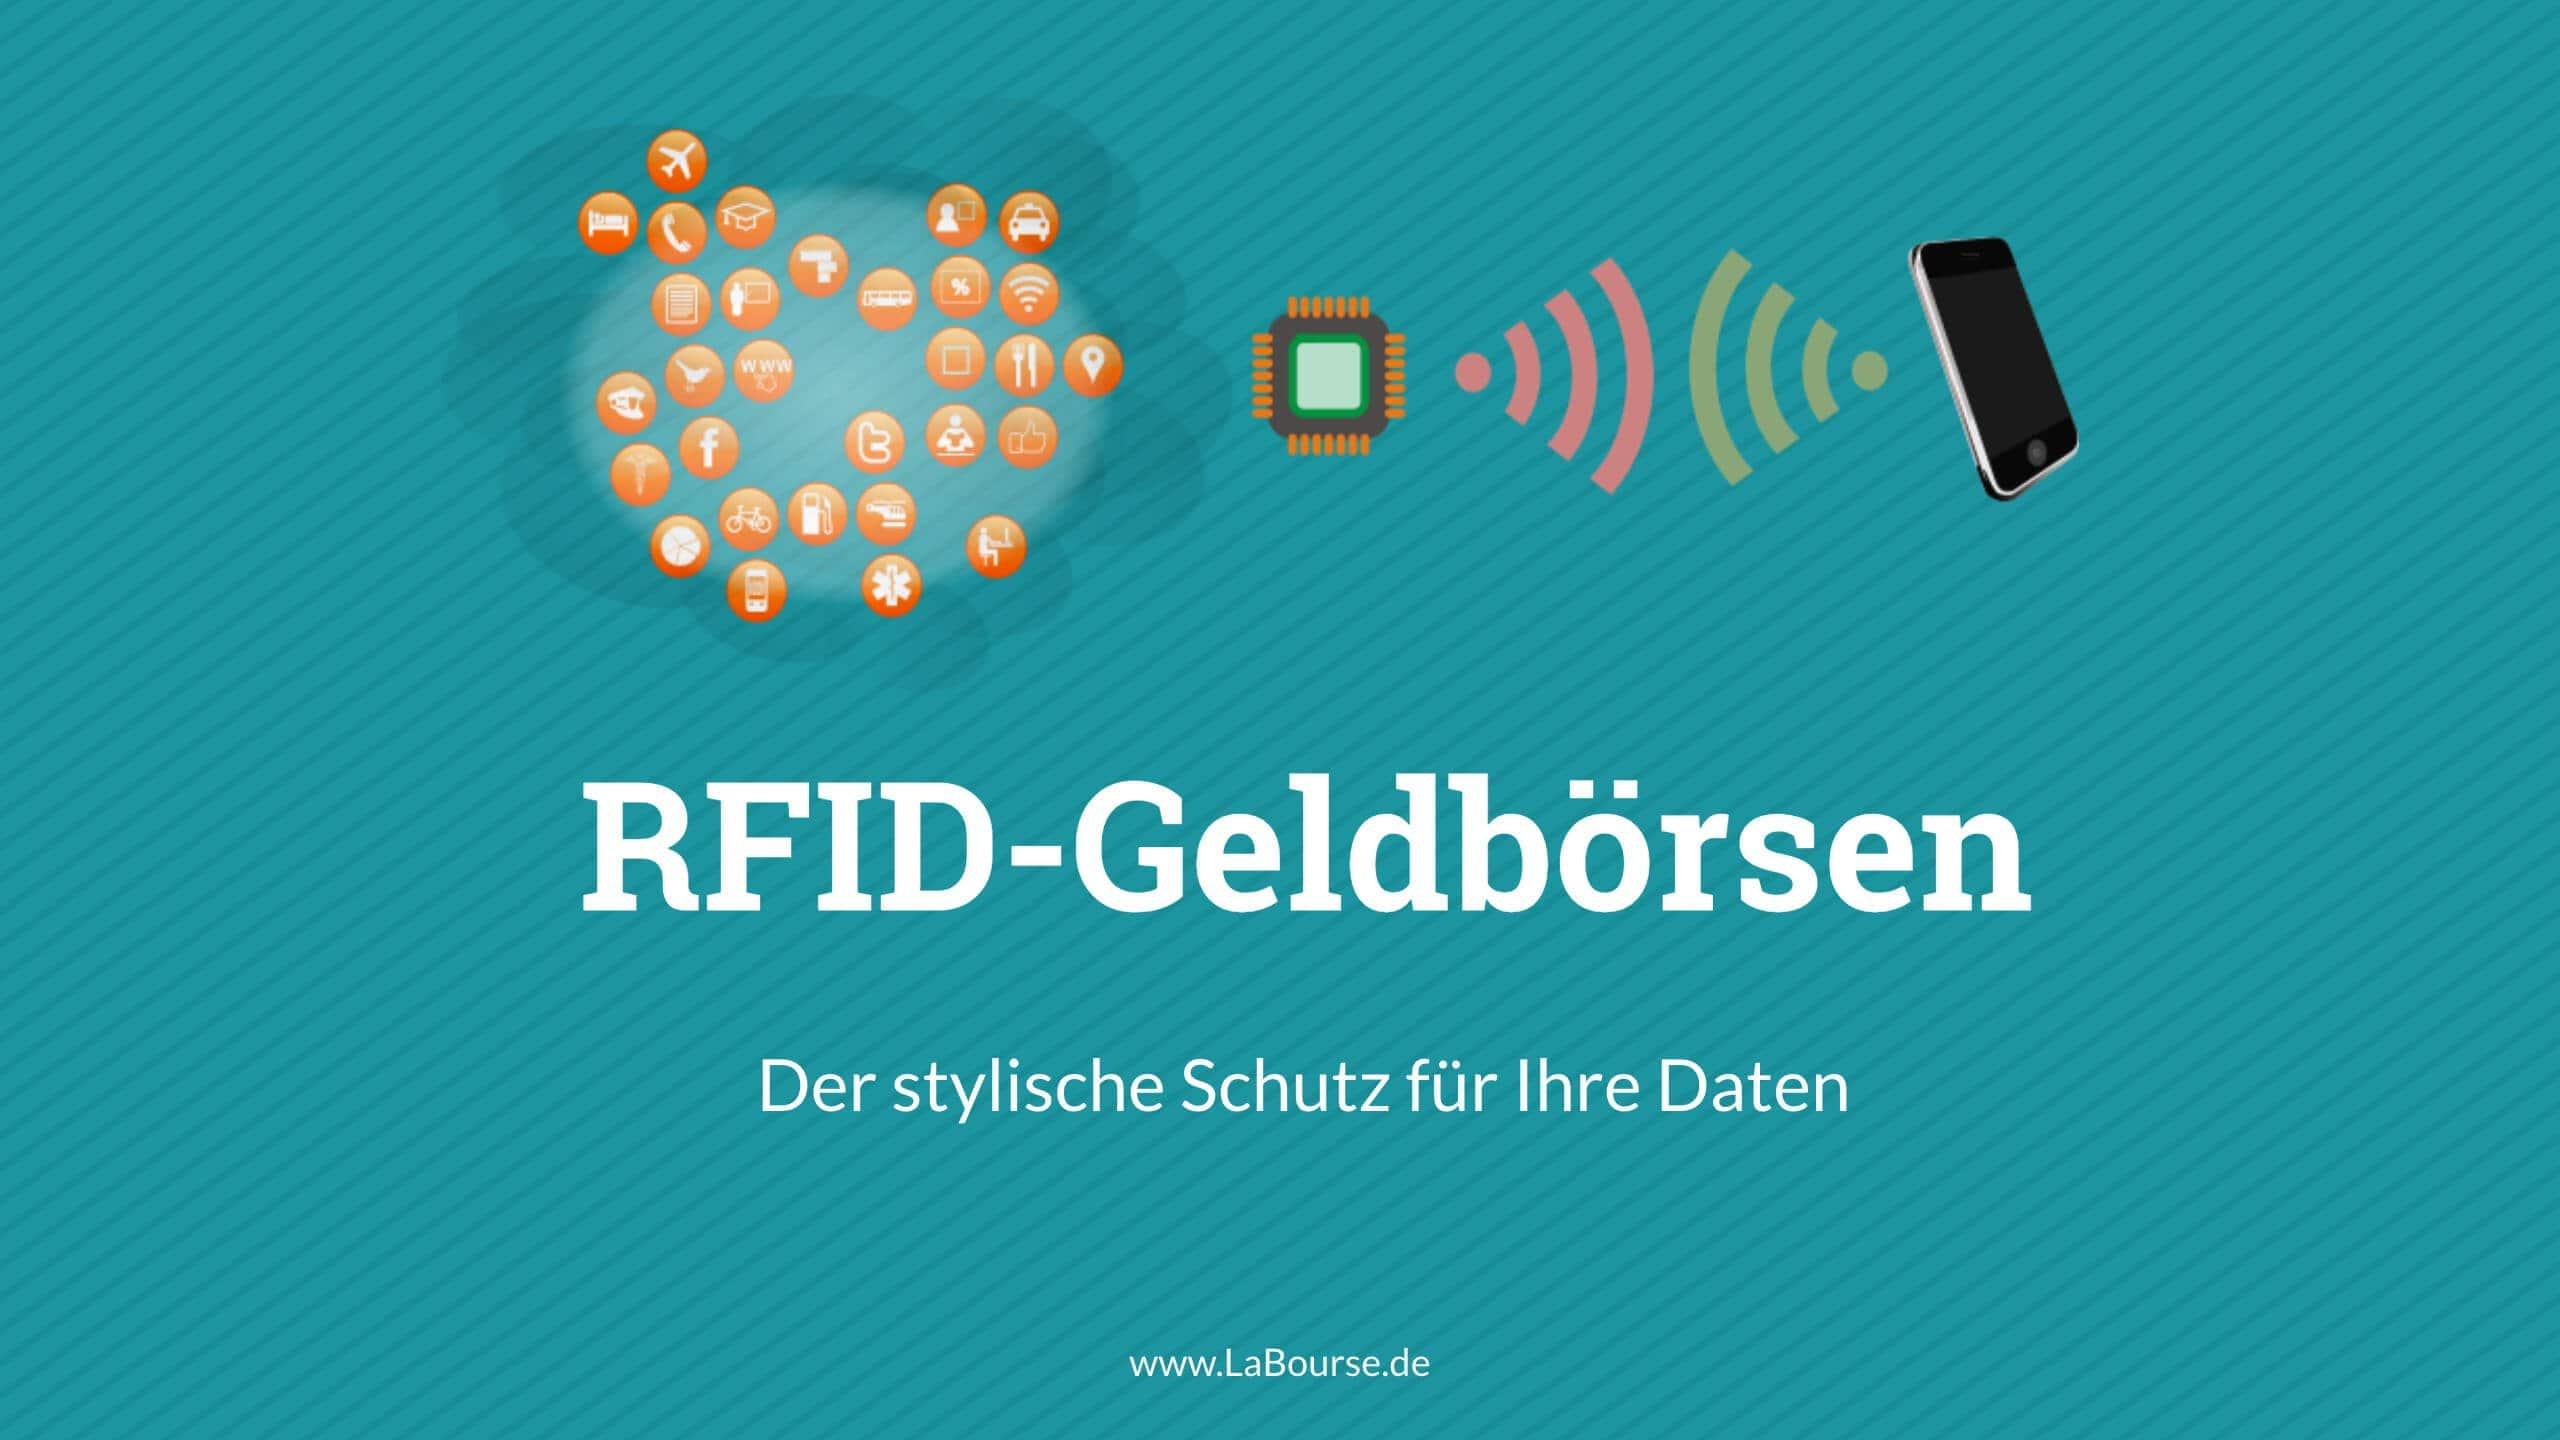 RFID-Geldbörsen